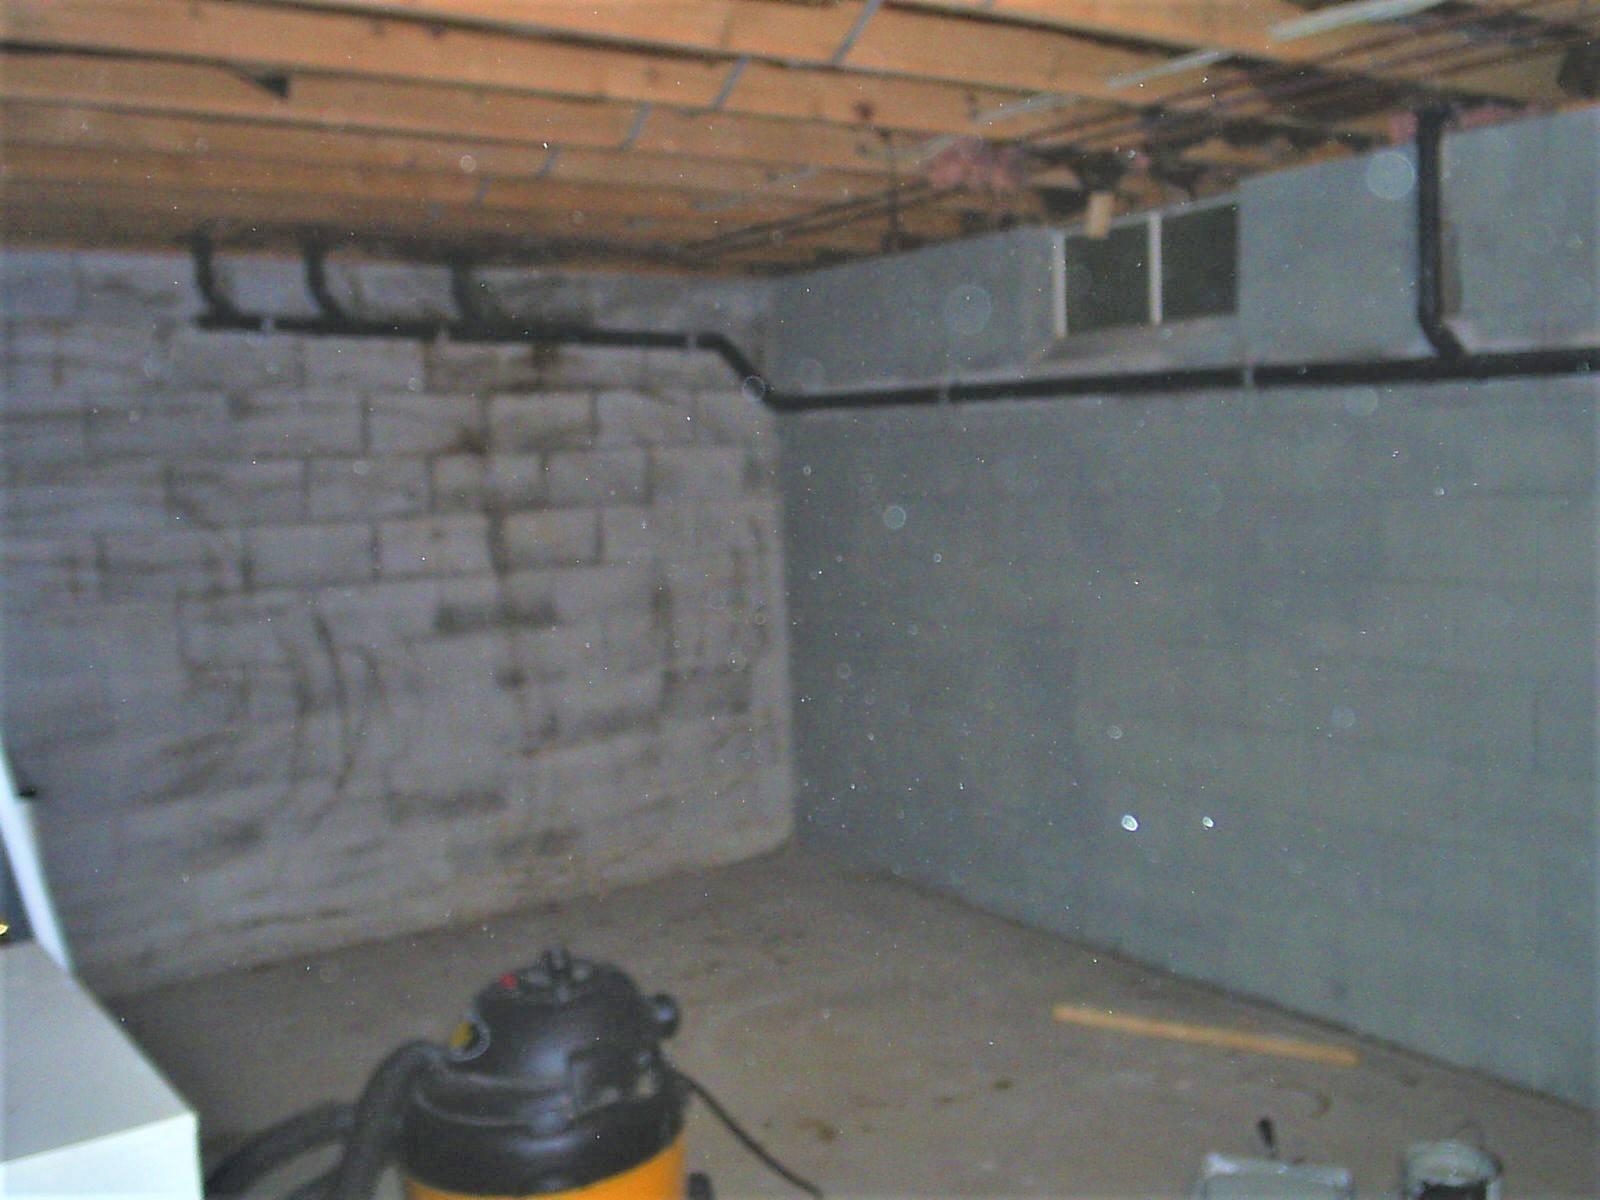 Dark Basement Before Remodeling